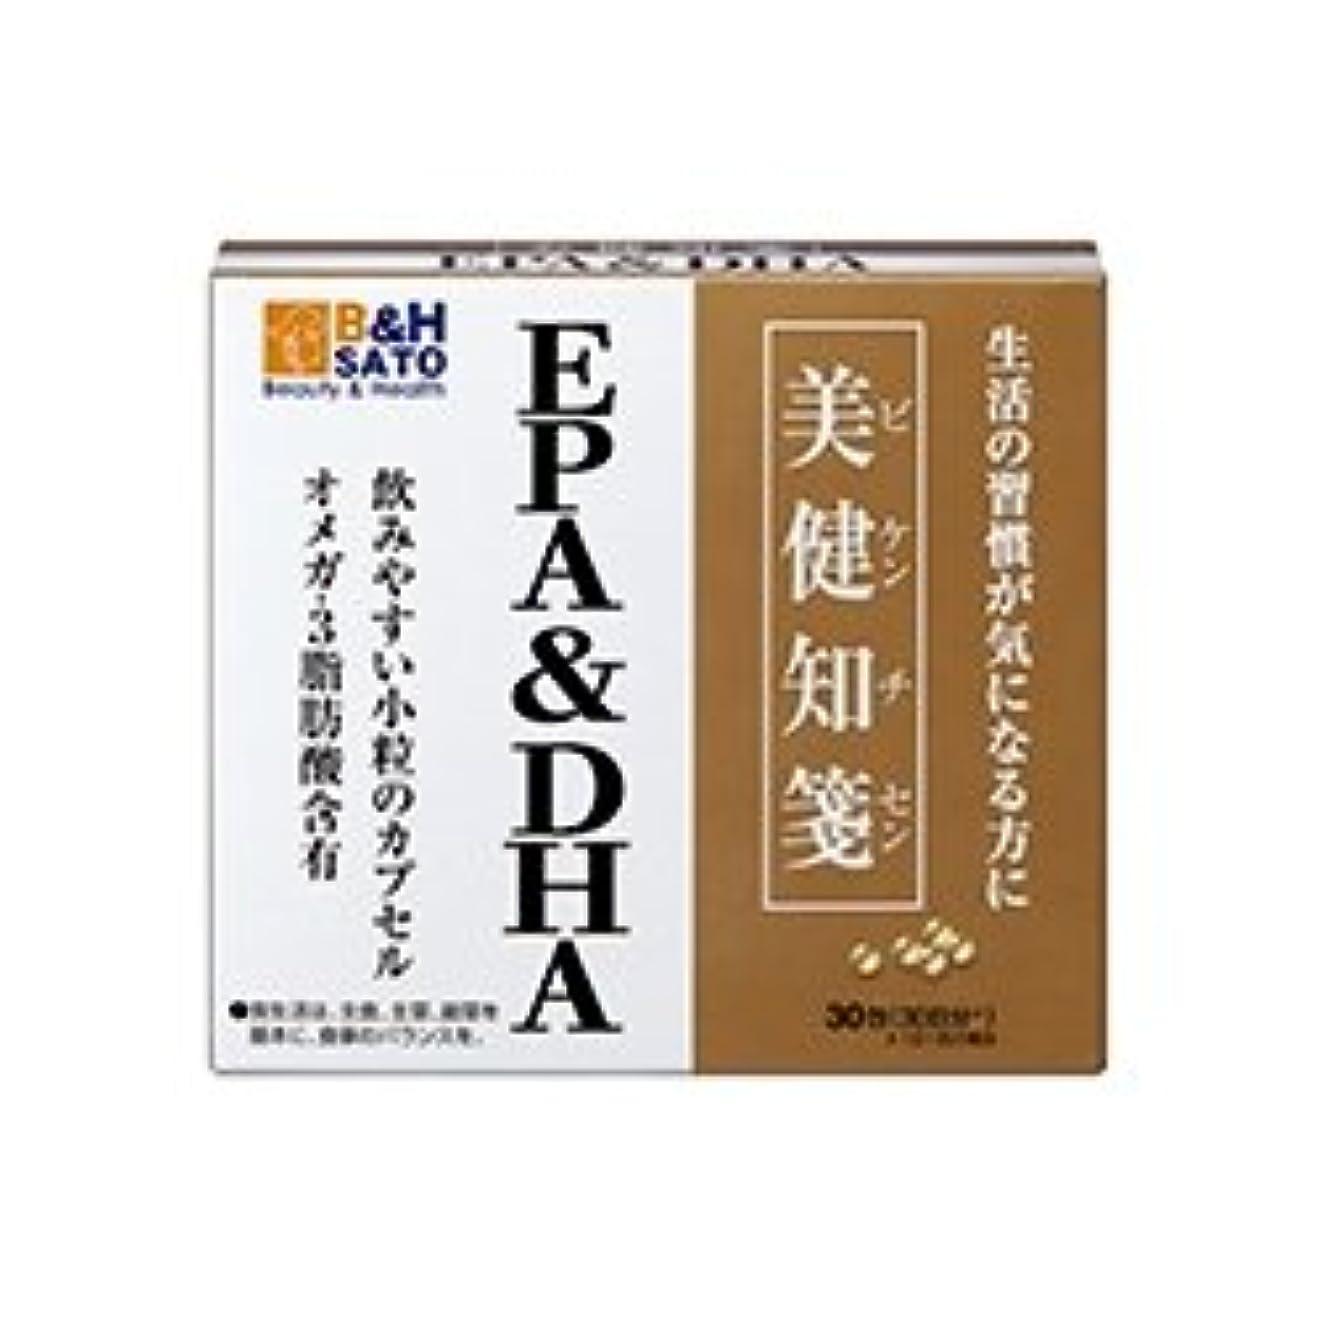 パイル気球省略佐藤製薬 美健知箋 EPA DHA 30包